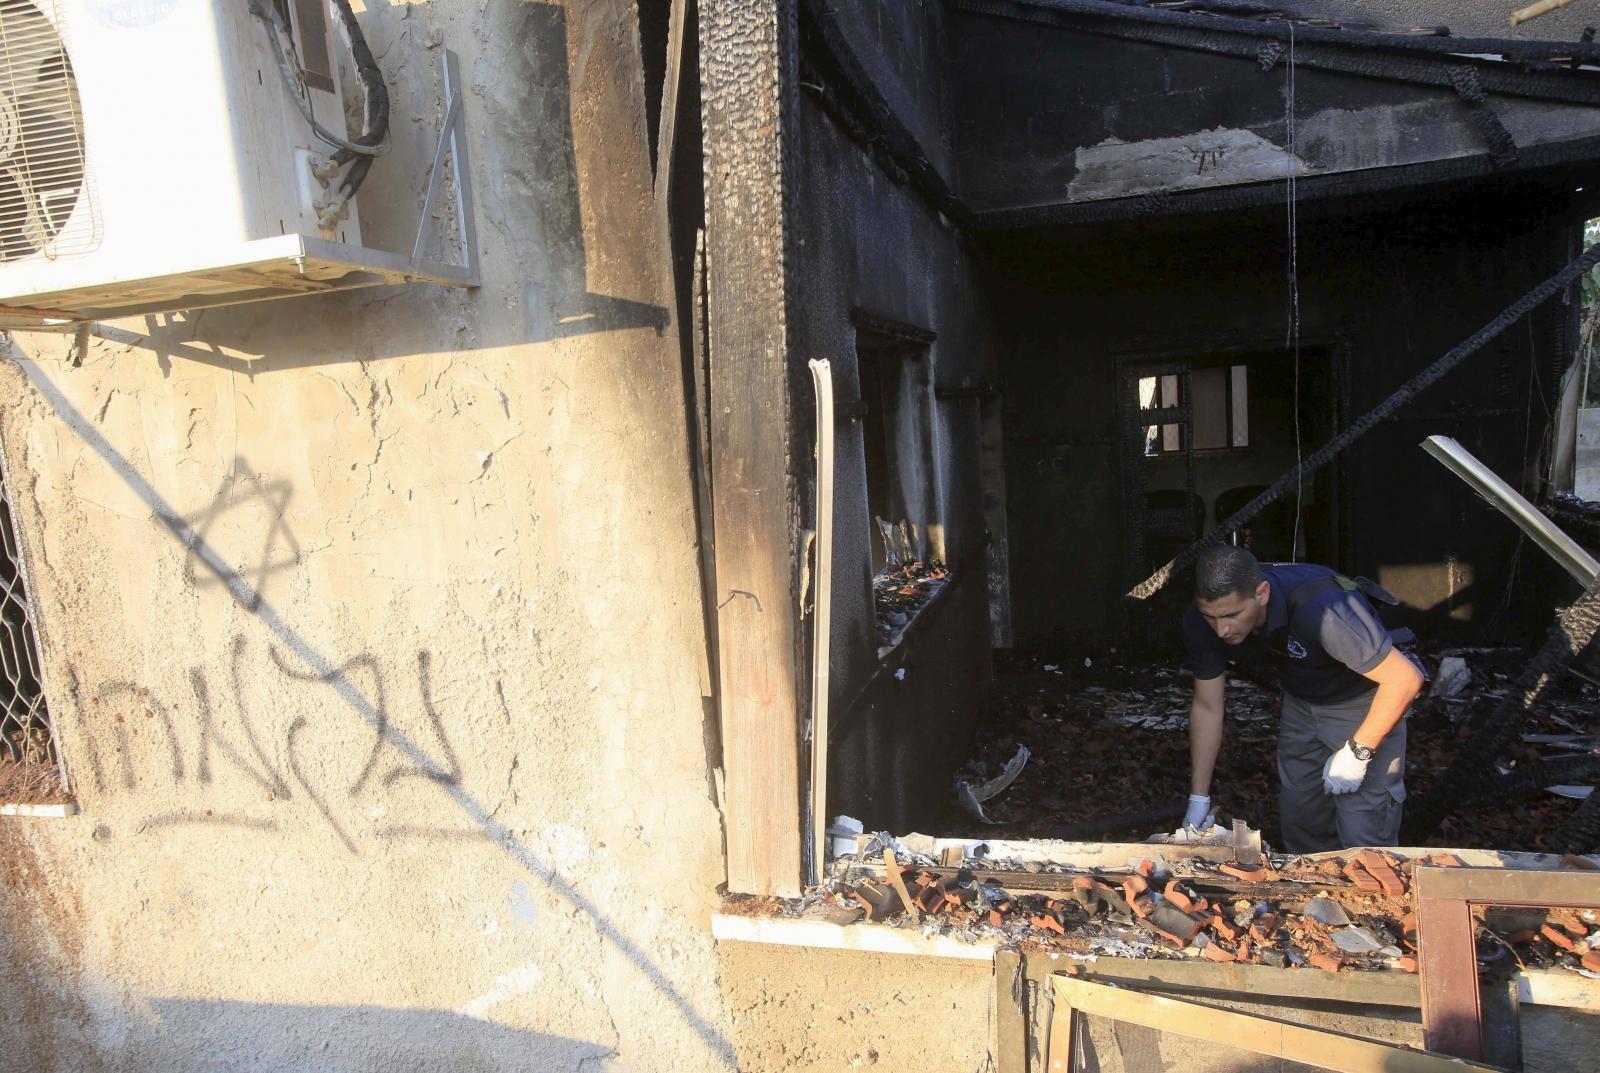 Palestinian toddler arson attack Nablus Duma